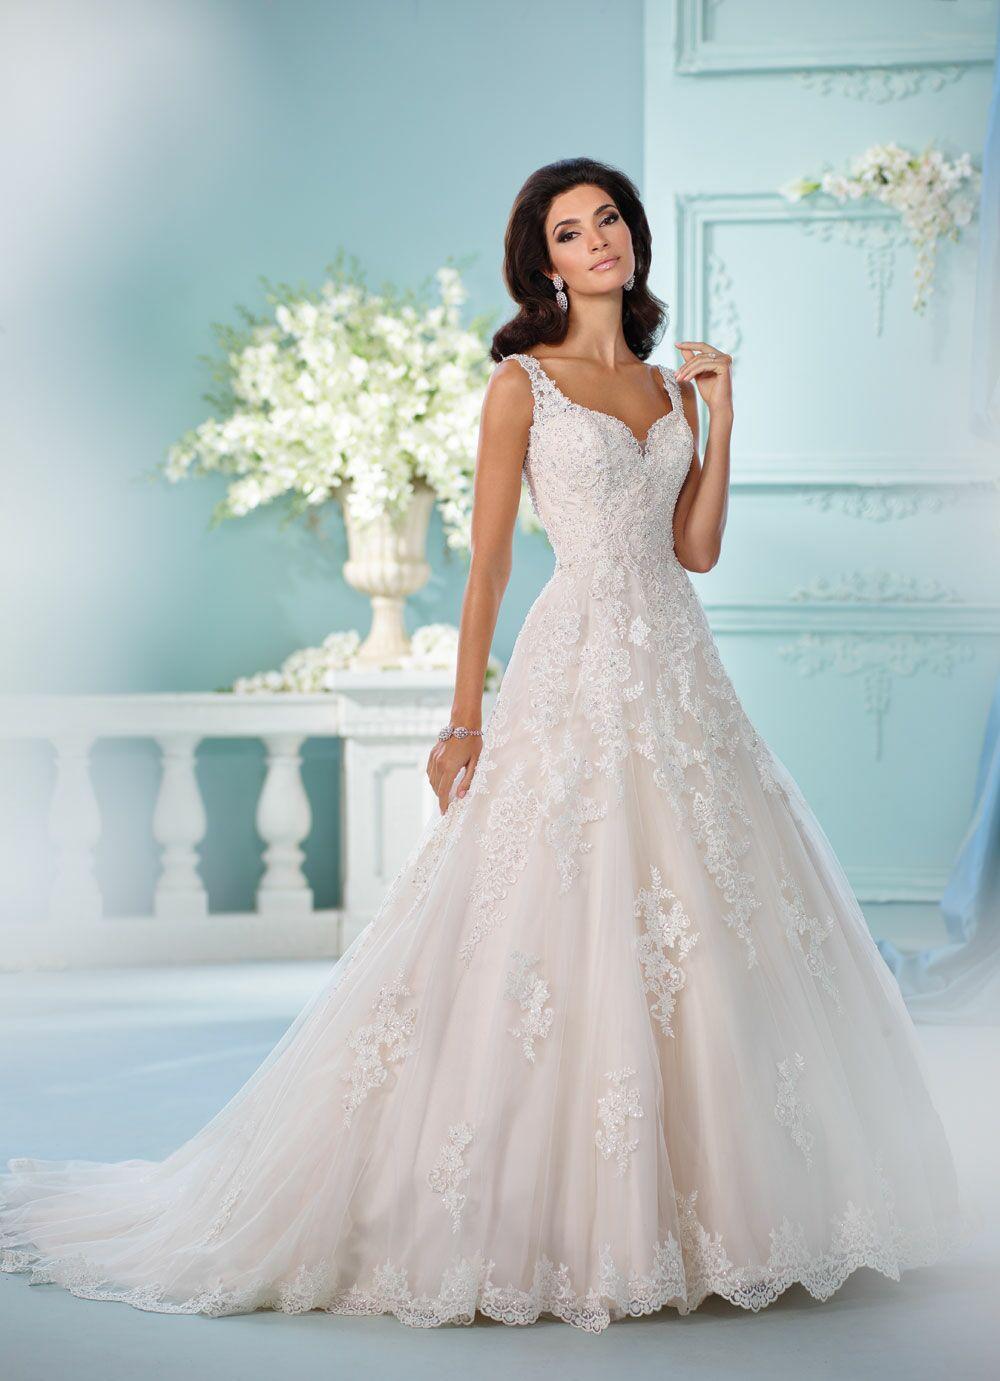 Amazing Size 30 Wedding Dress Model - All Wedding Dresses ...